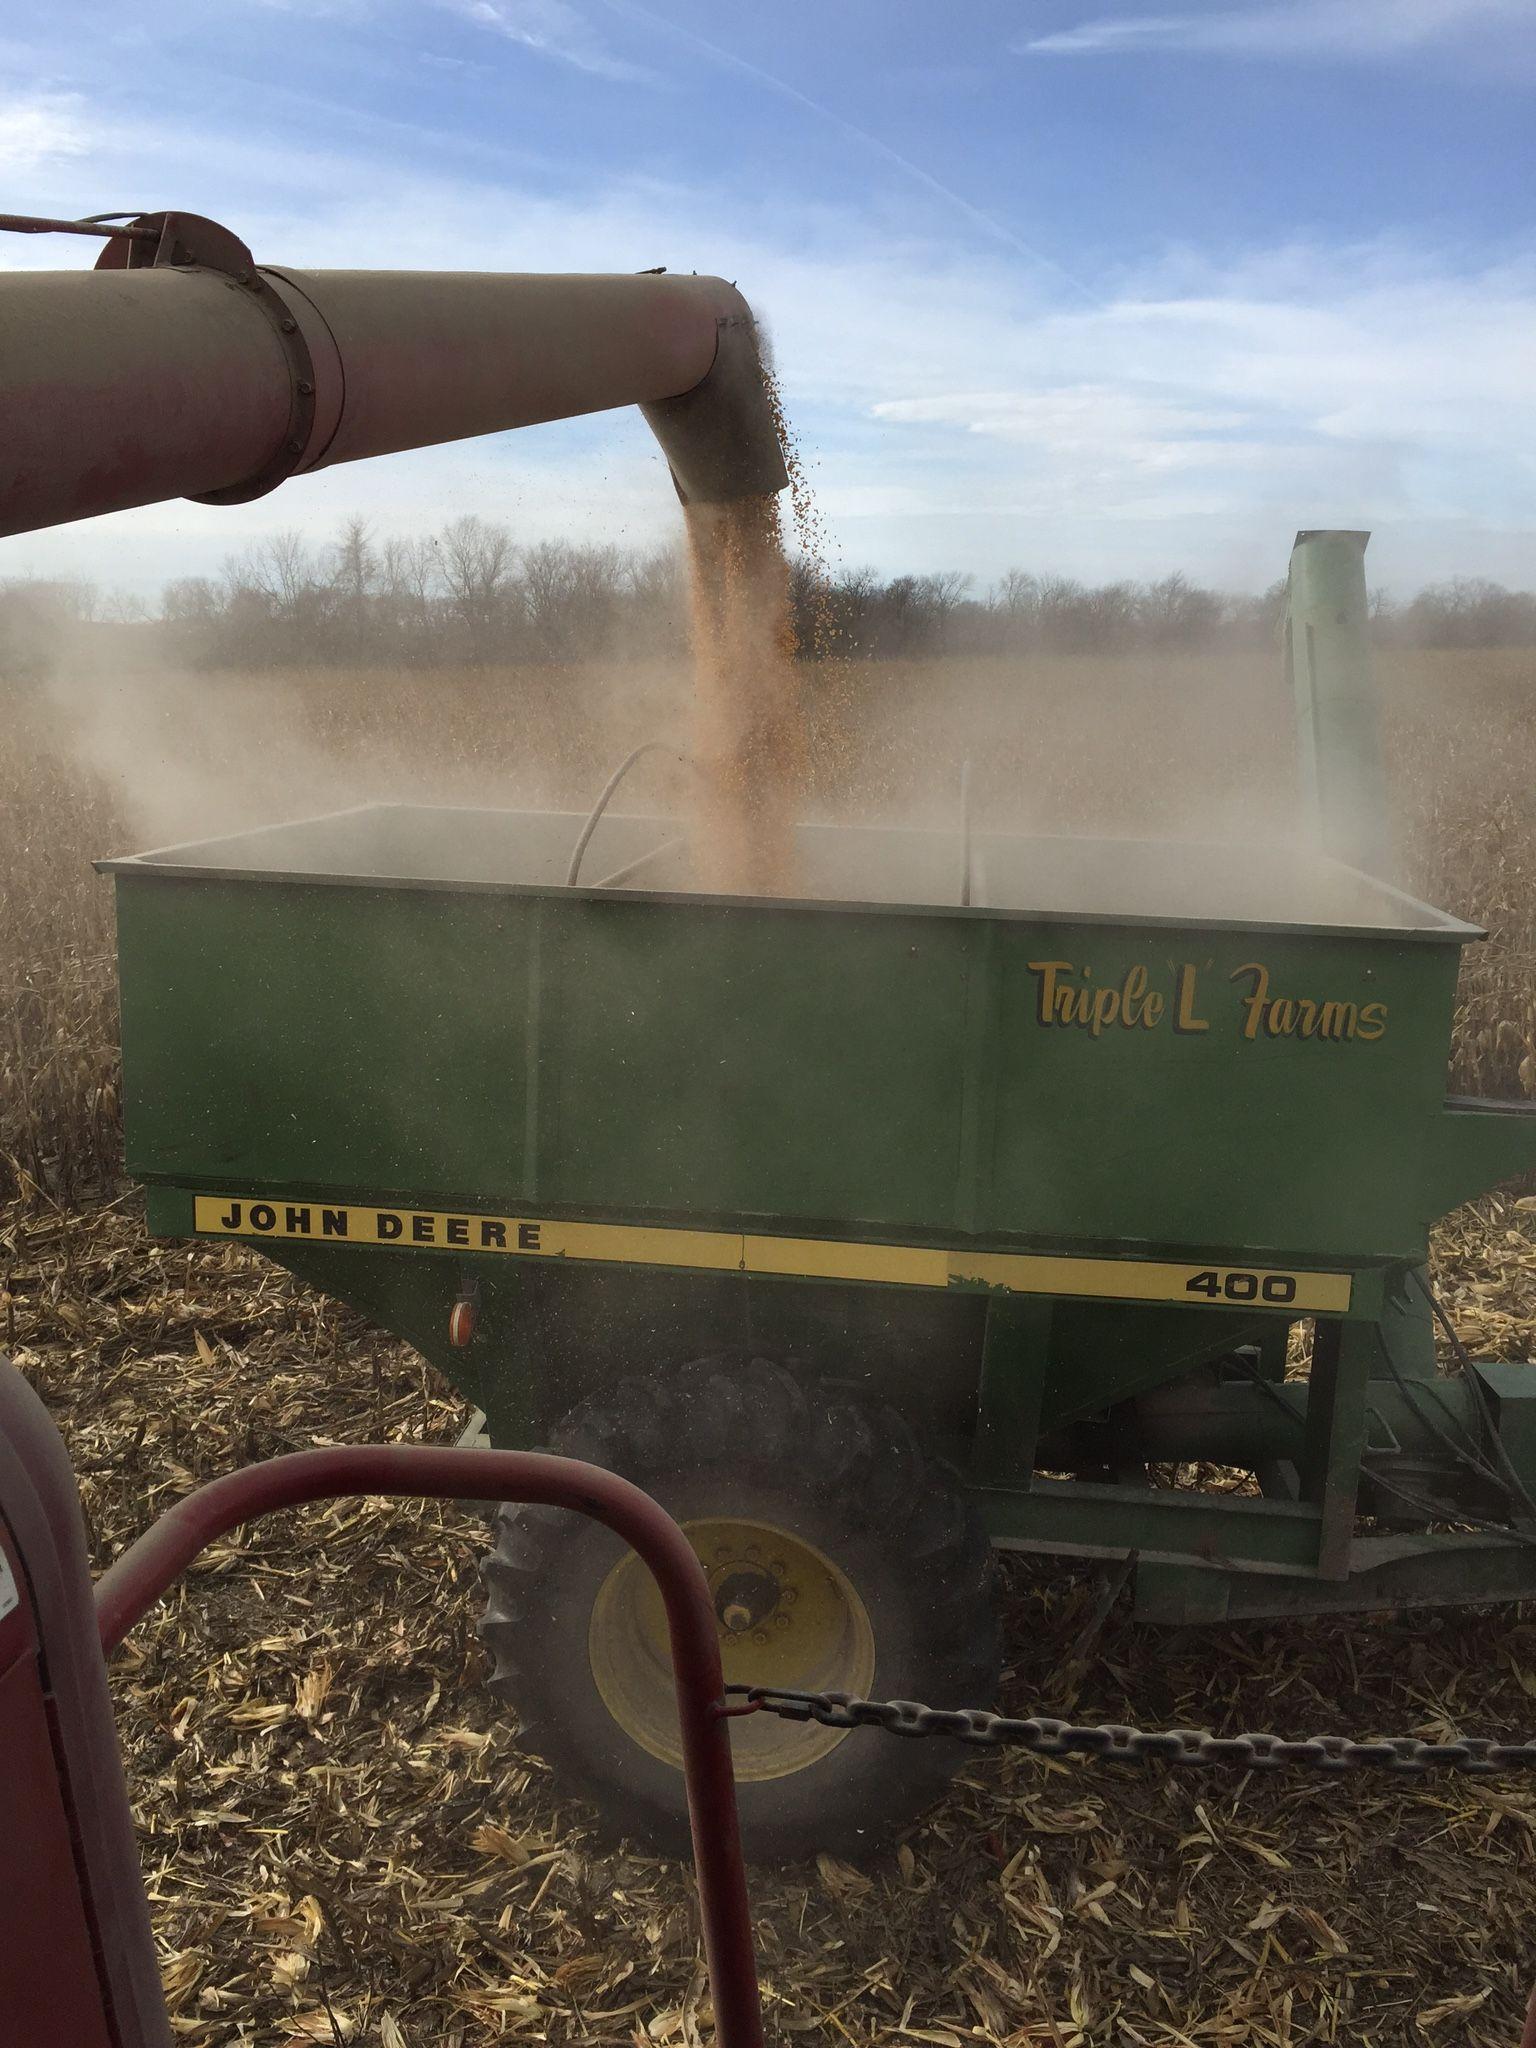 Solutions for grain drying, grain handling, and grain